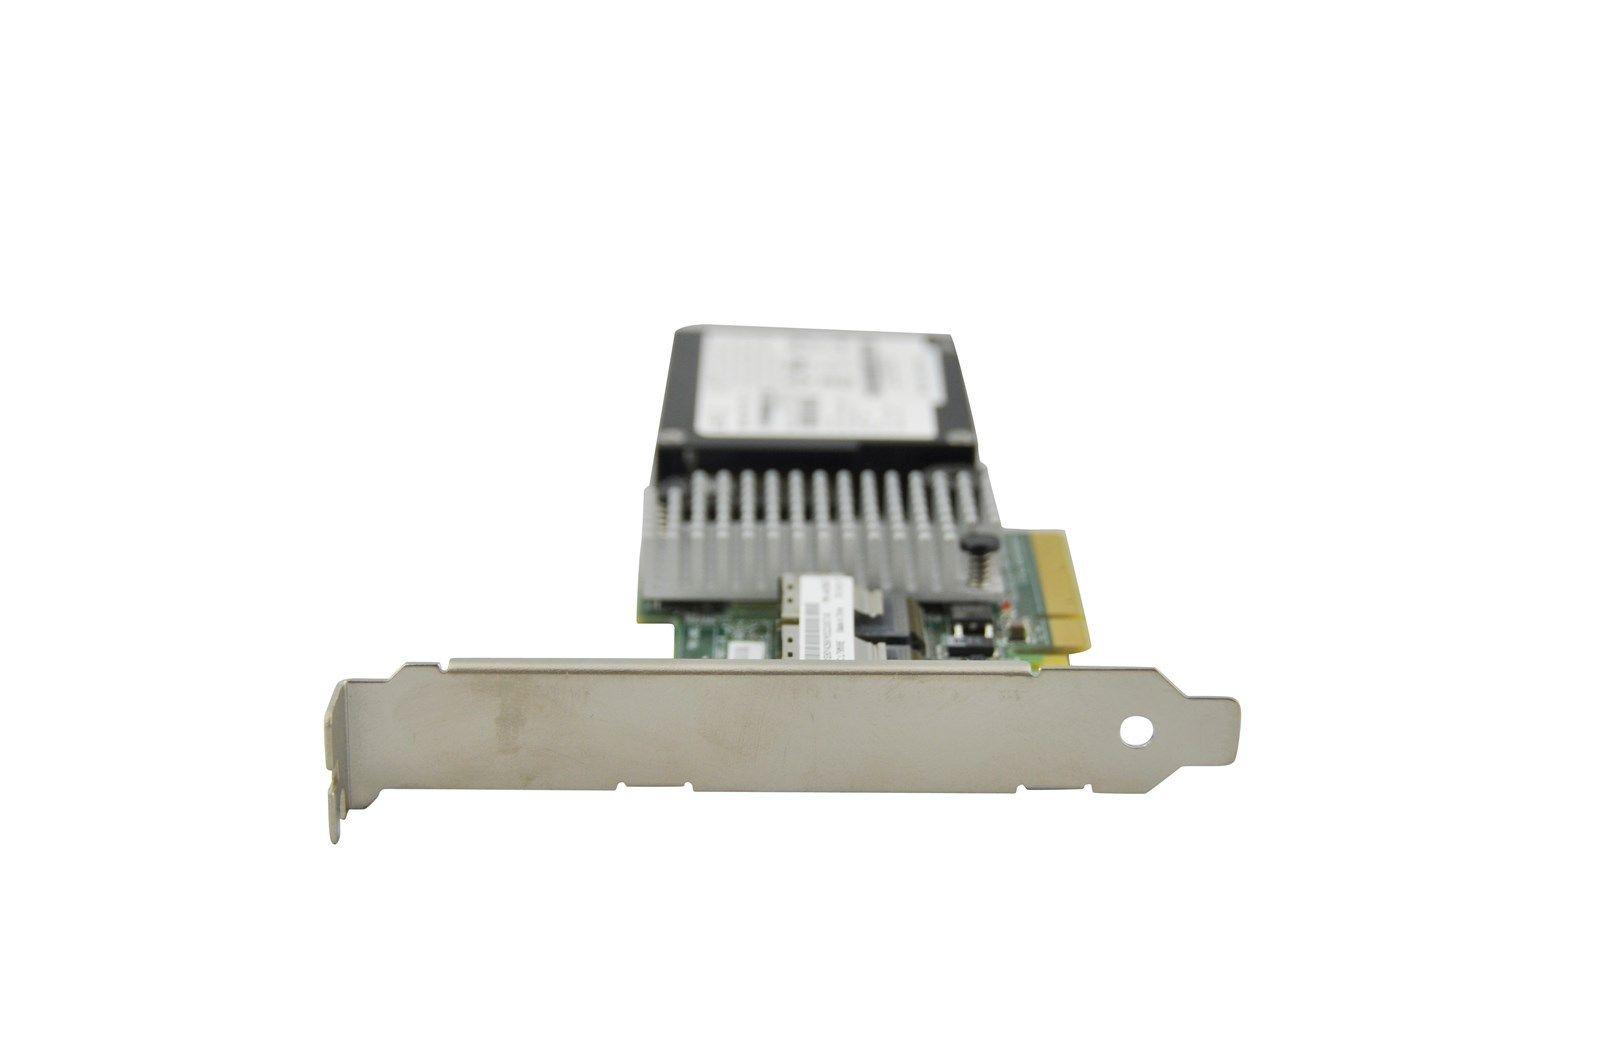 IBM SERVERAID M5015 PCI-E 6GB/S SAS/SATA  RAID CONTROLLER (46C8927)